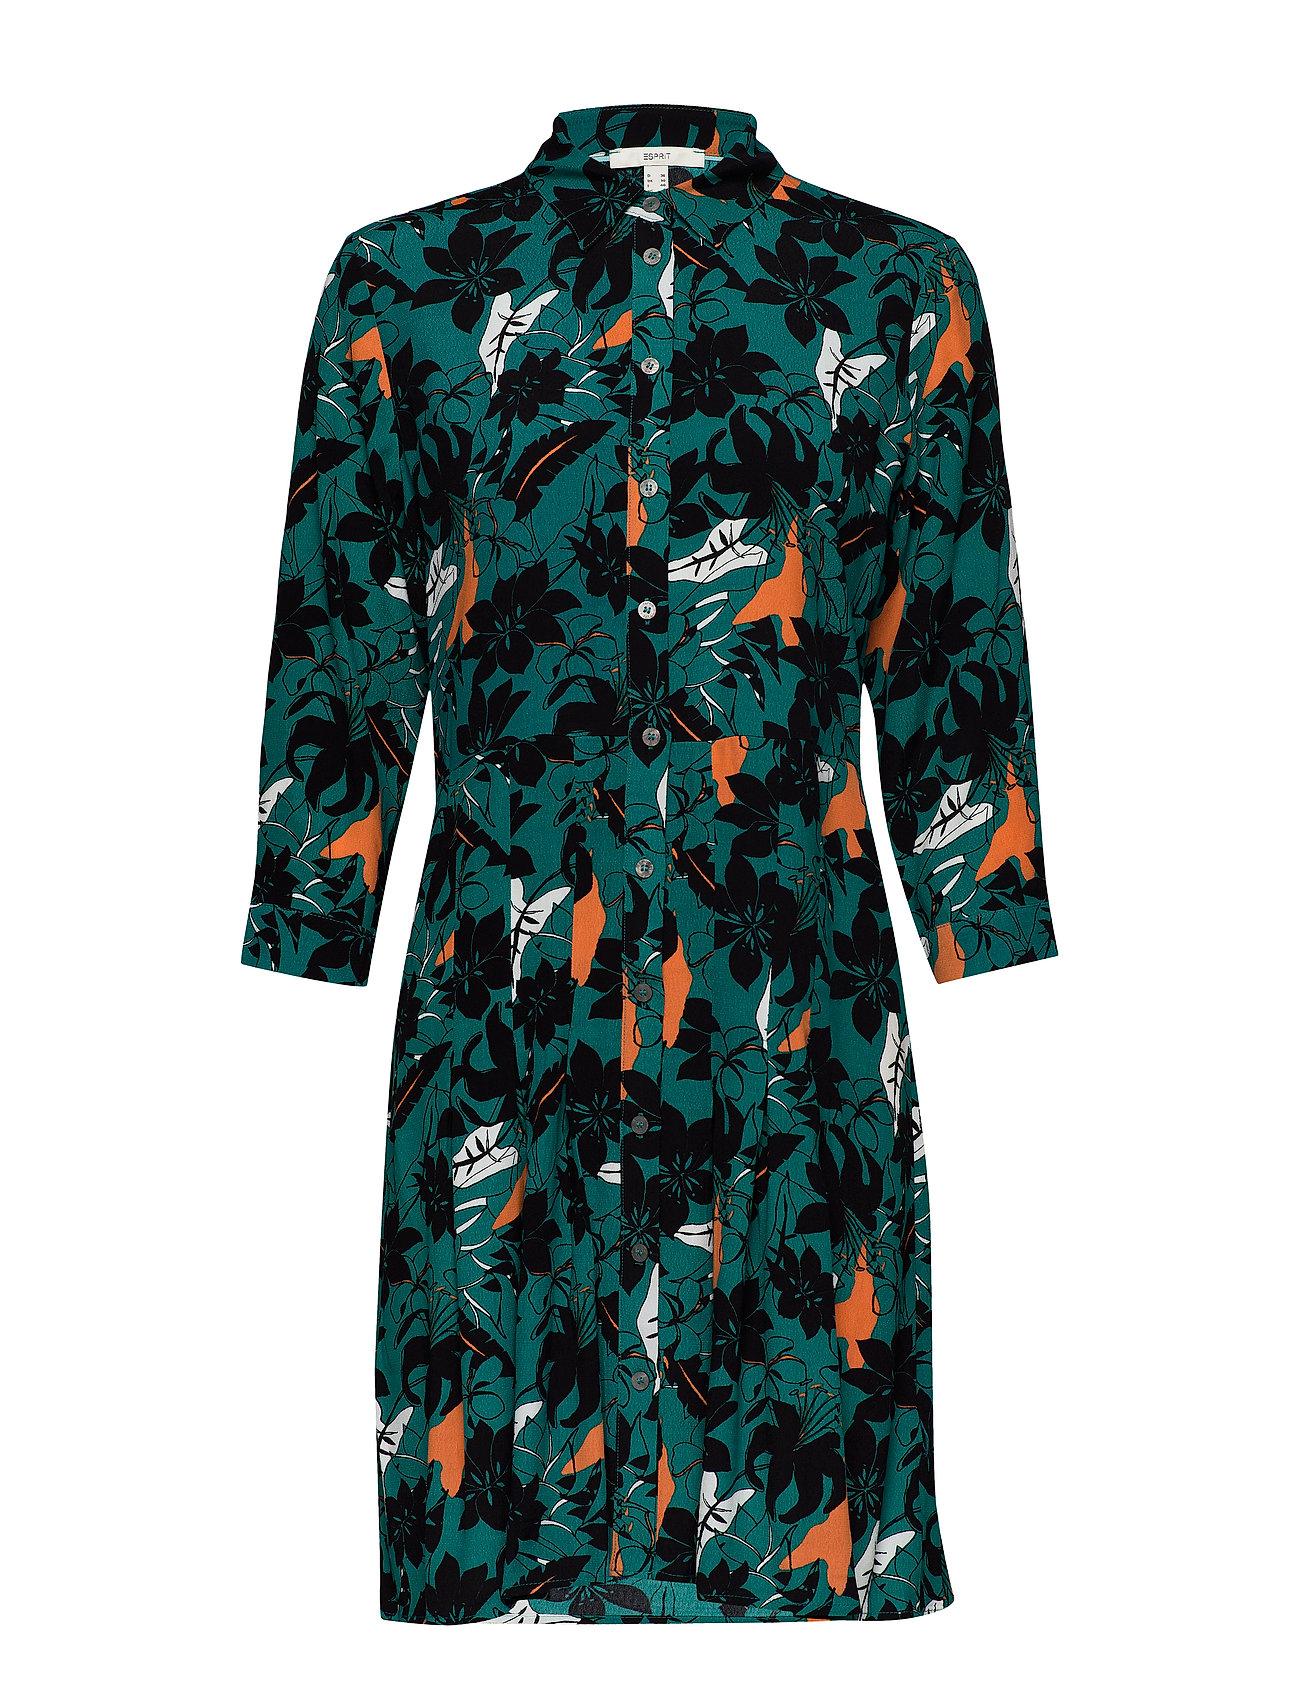 Esprit Casual Dresses light woven - TEAL GREEN